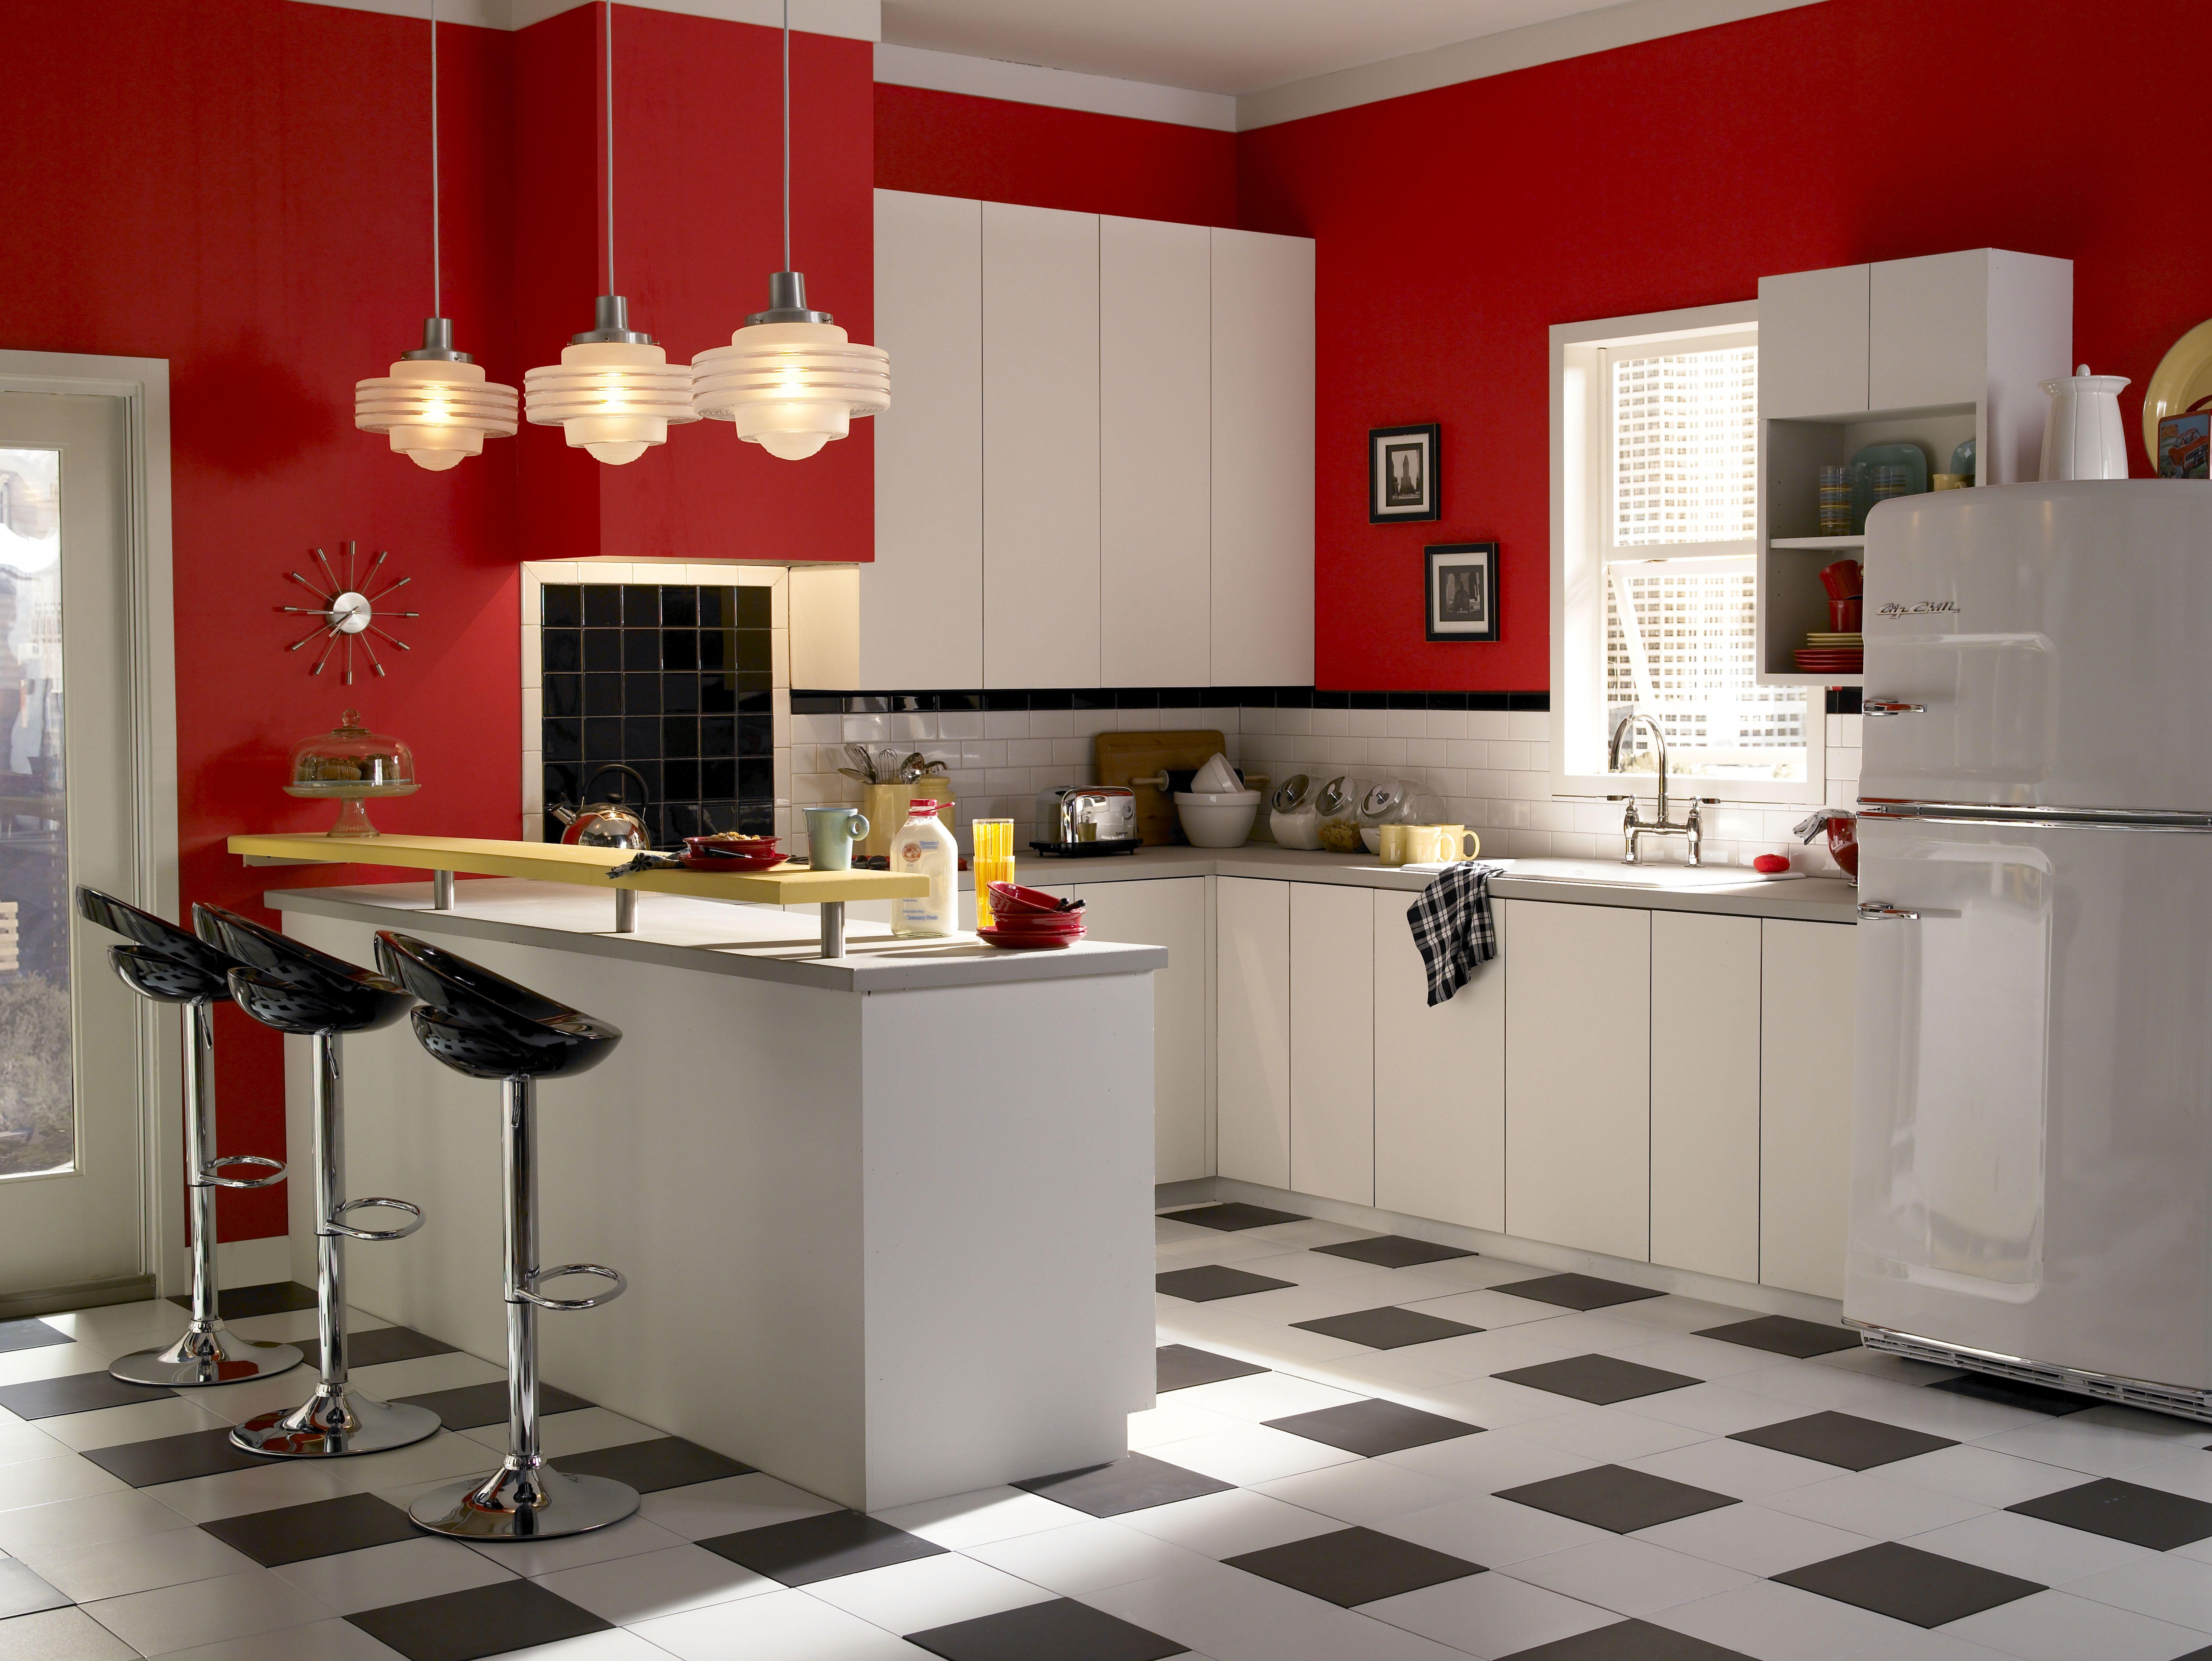 Retro Kitchen Appliances Gallery Big Chill Estilo de